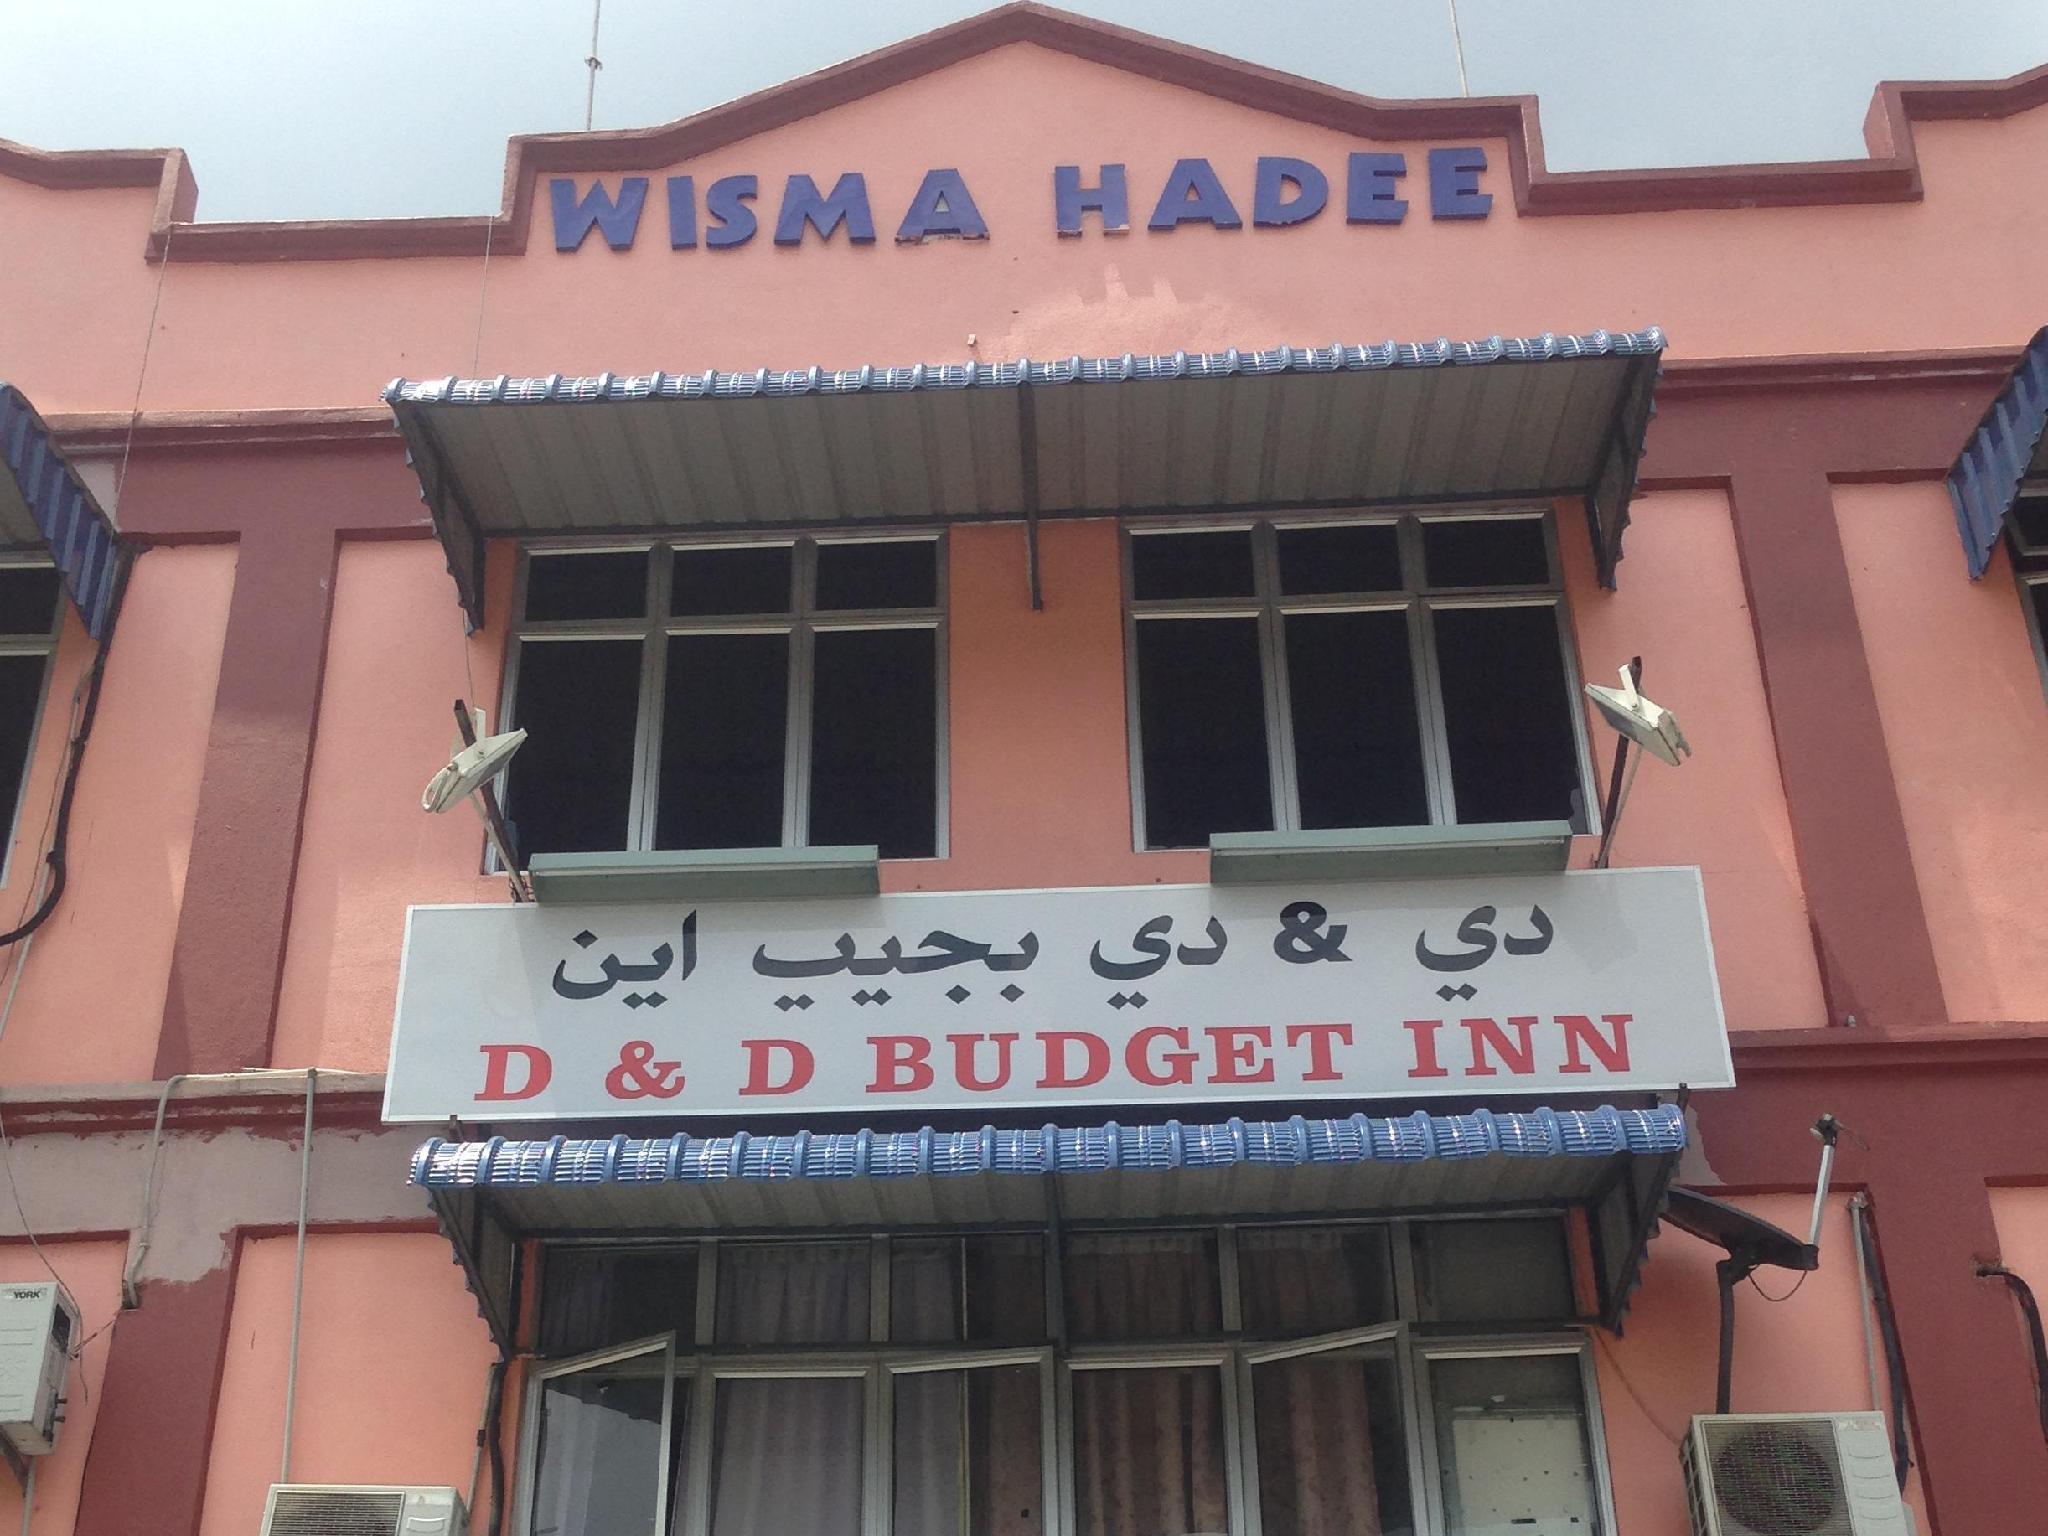 D & D Budget Inn, Kota Bharu